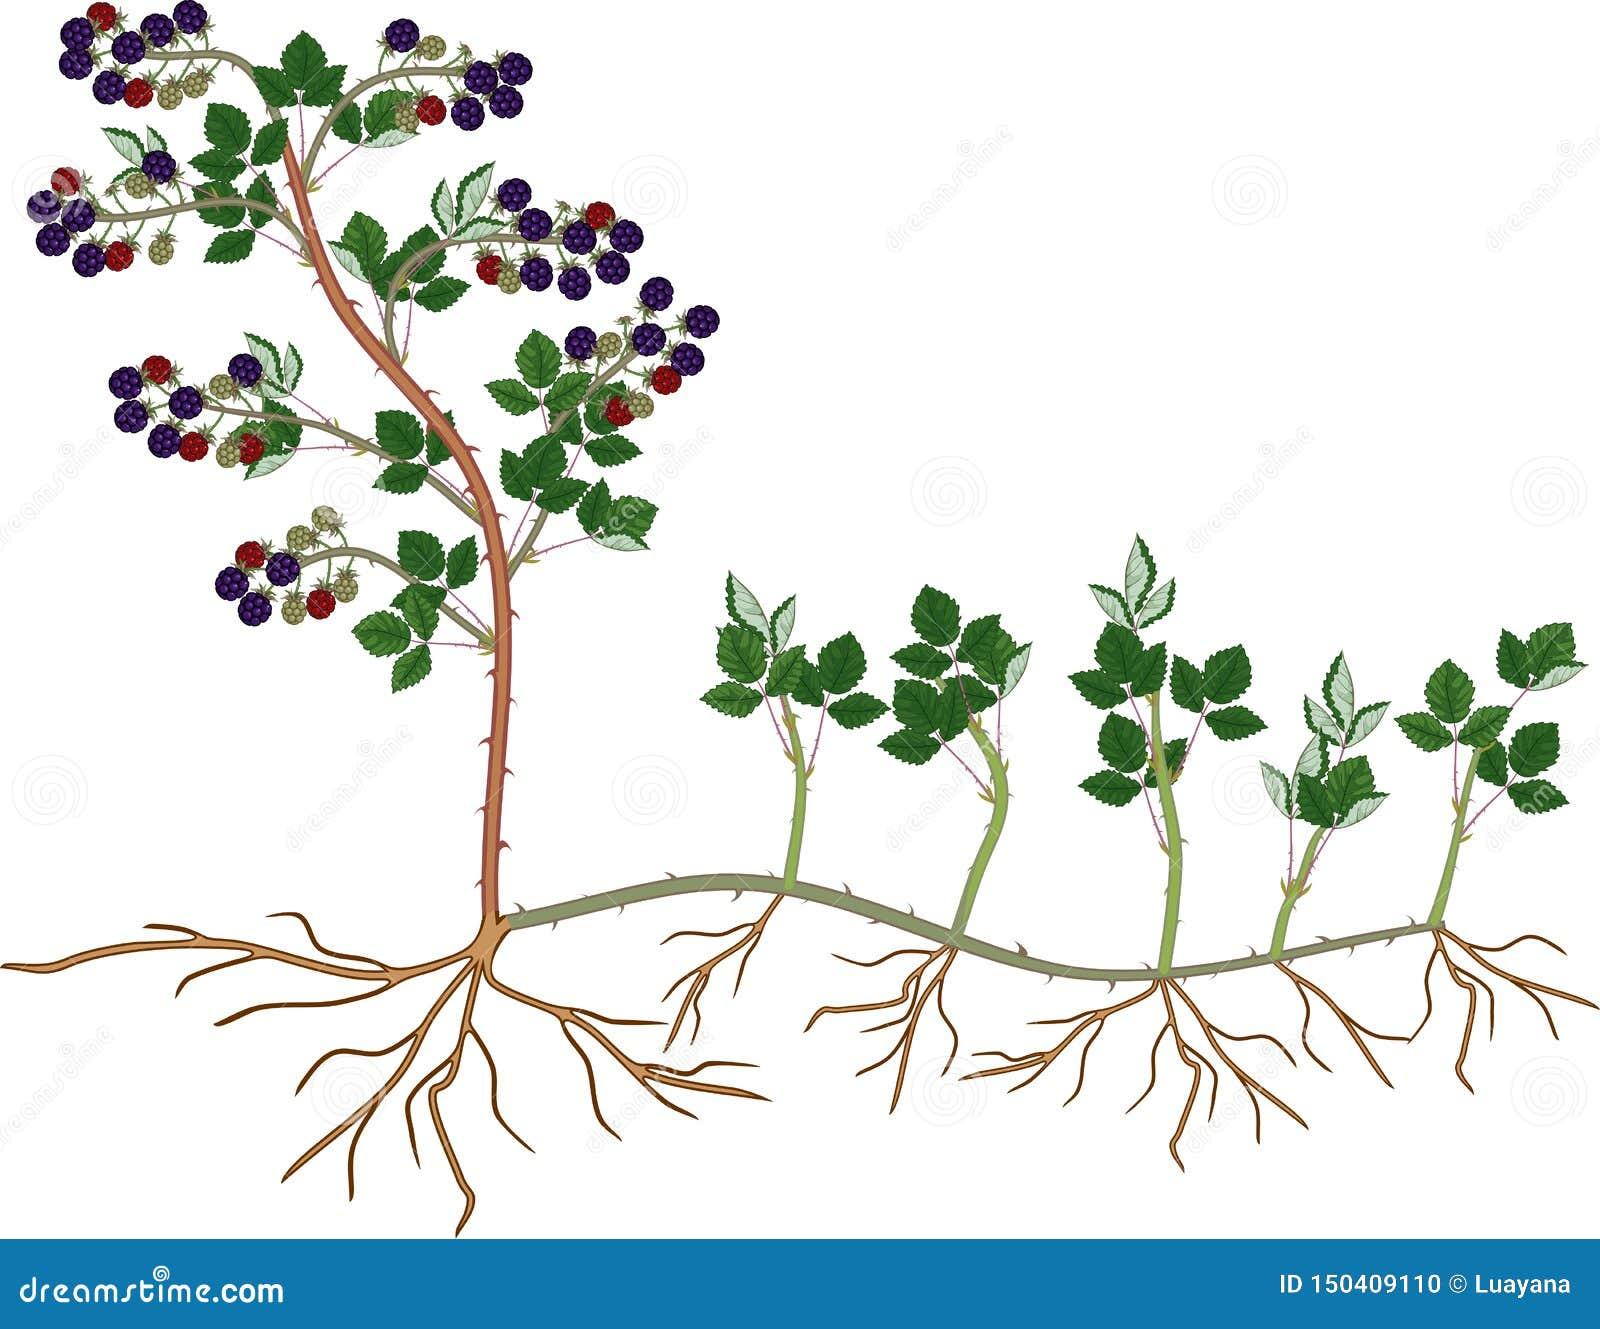 Plant Propagation By Sucker Blackberry Plant Vegetative Reproduction Scheme Stock Vector Illustration Of Propagate Agriculture 150409110